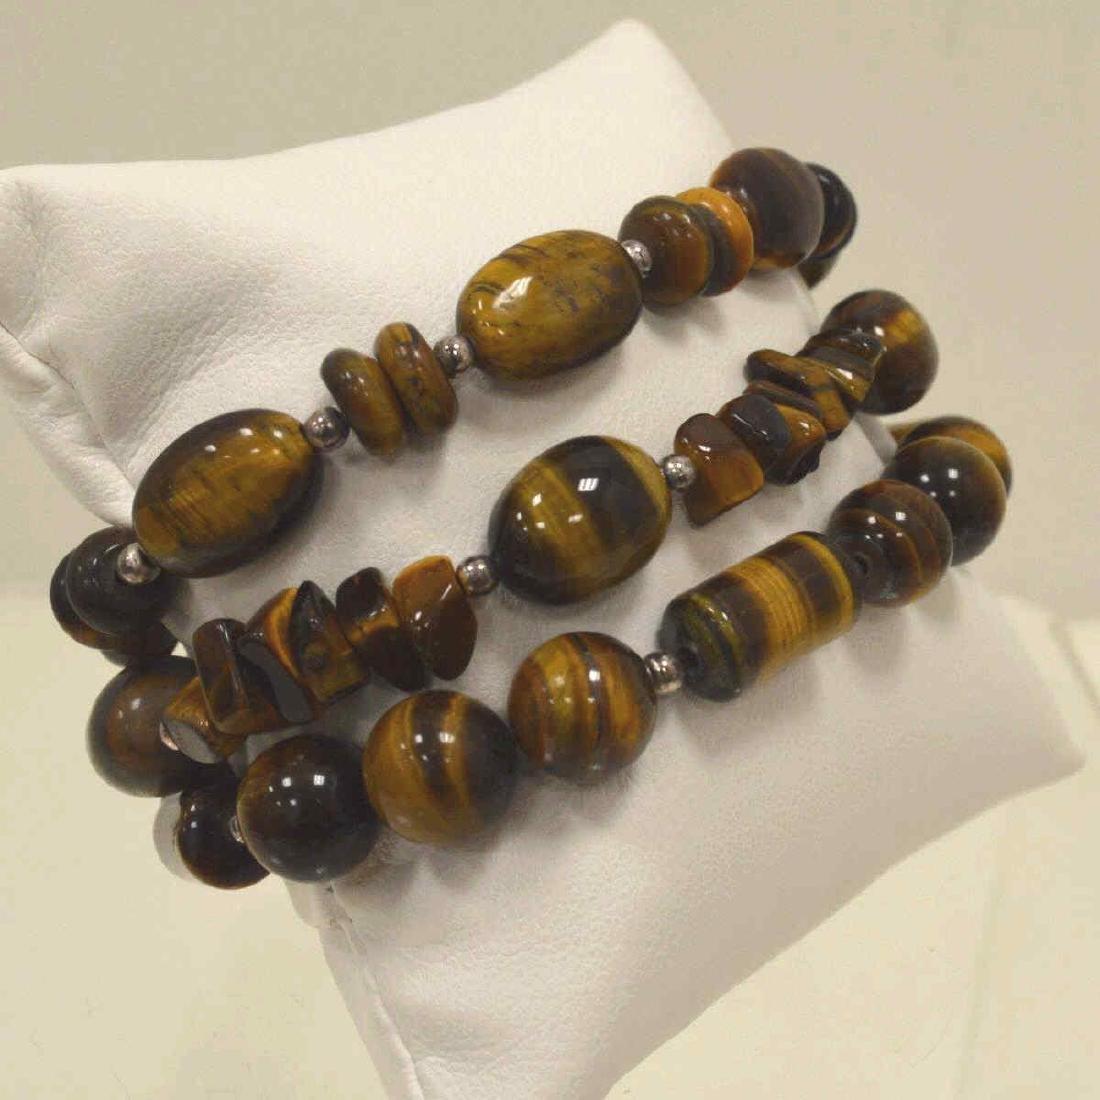 Lot of tiger's eye bead bracelets - 2